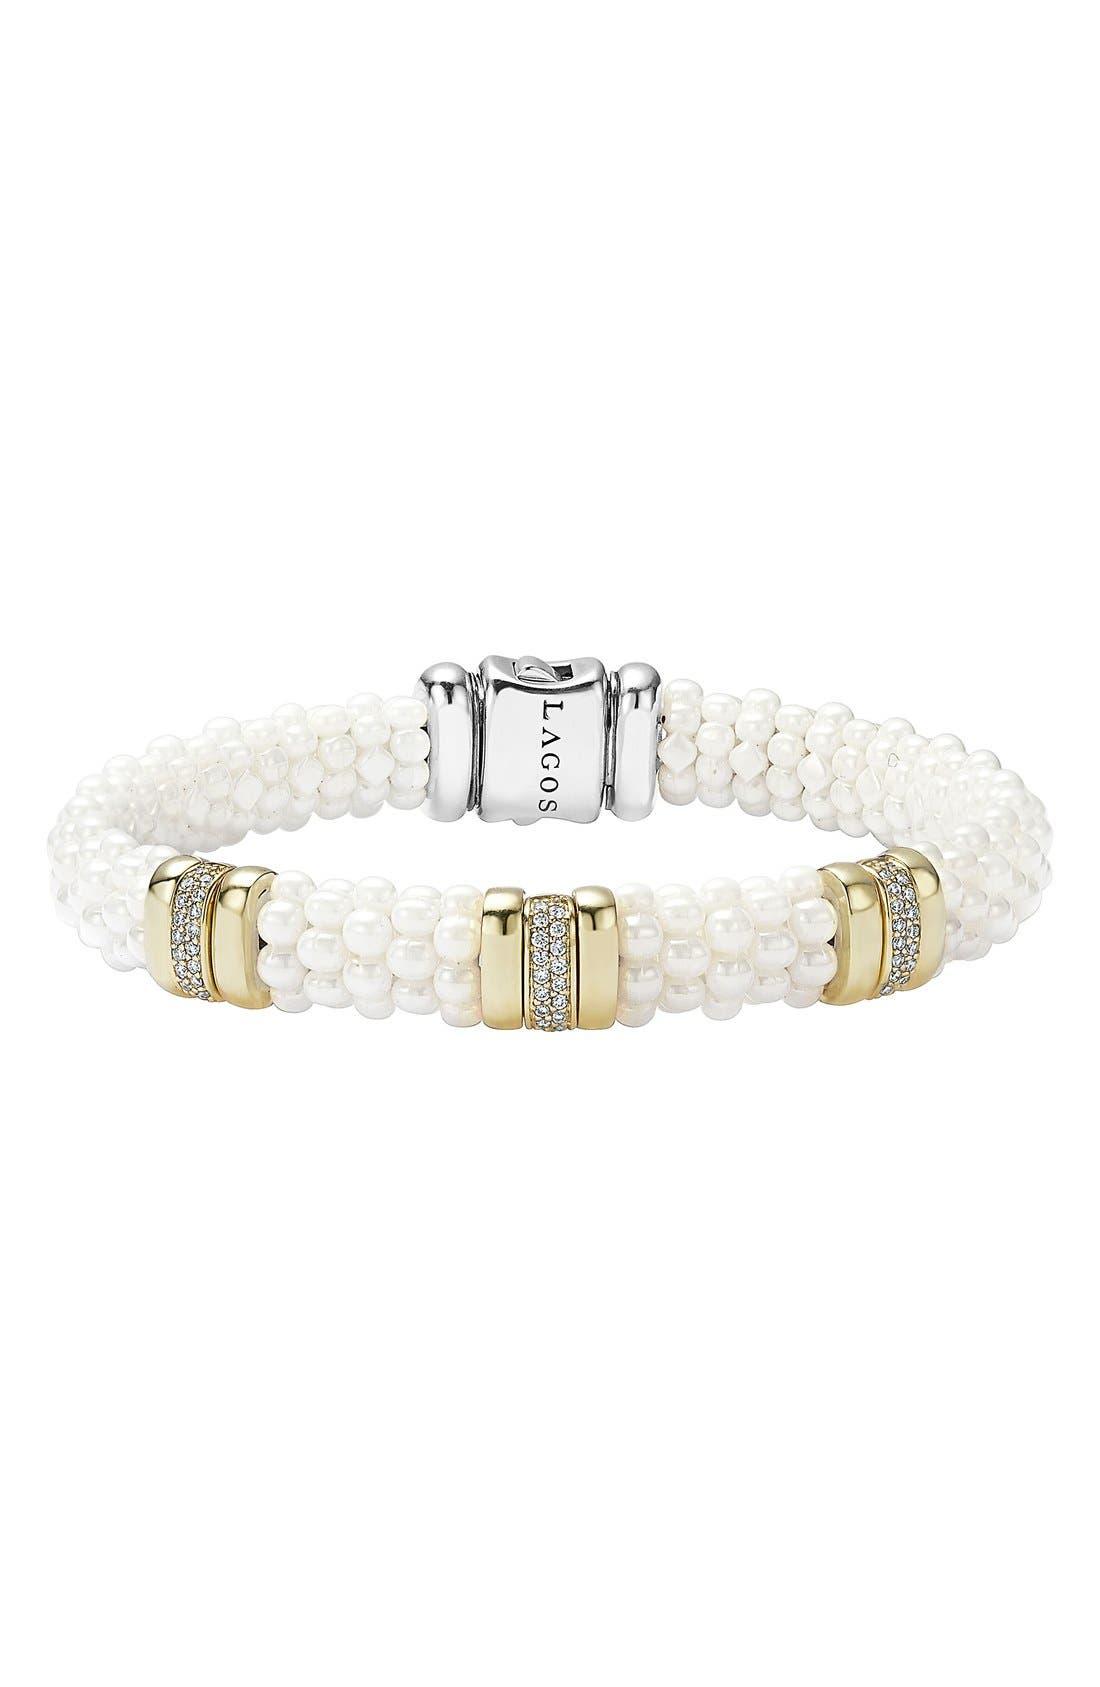 Main Image - LAGOS 'White Caviar' Three Station Bracelet